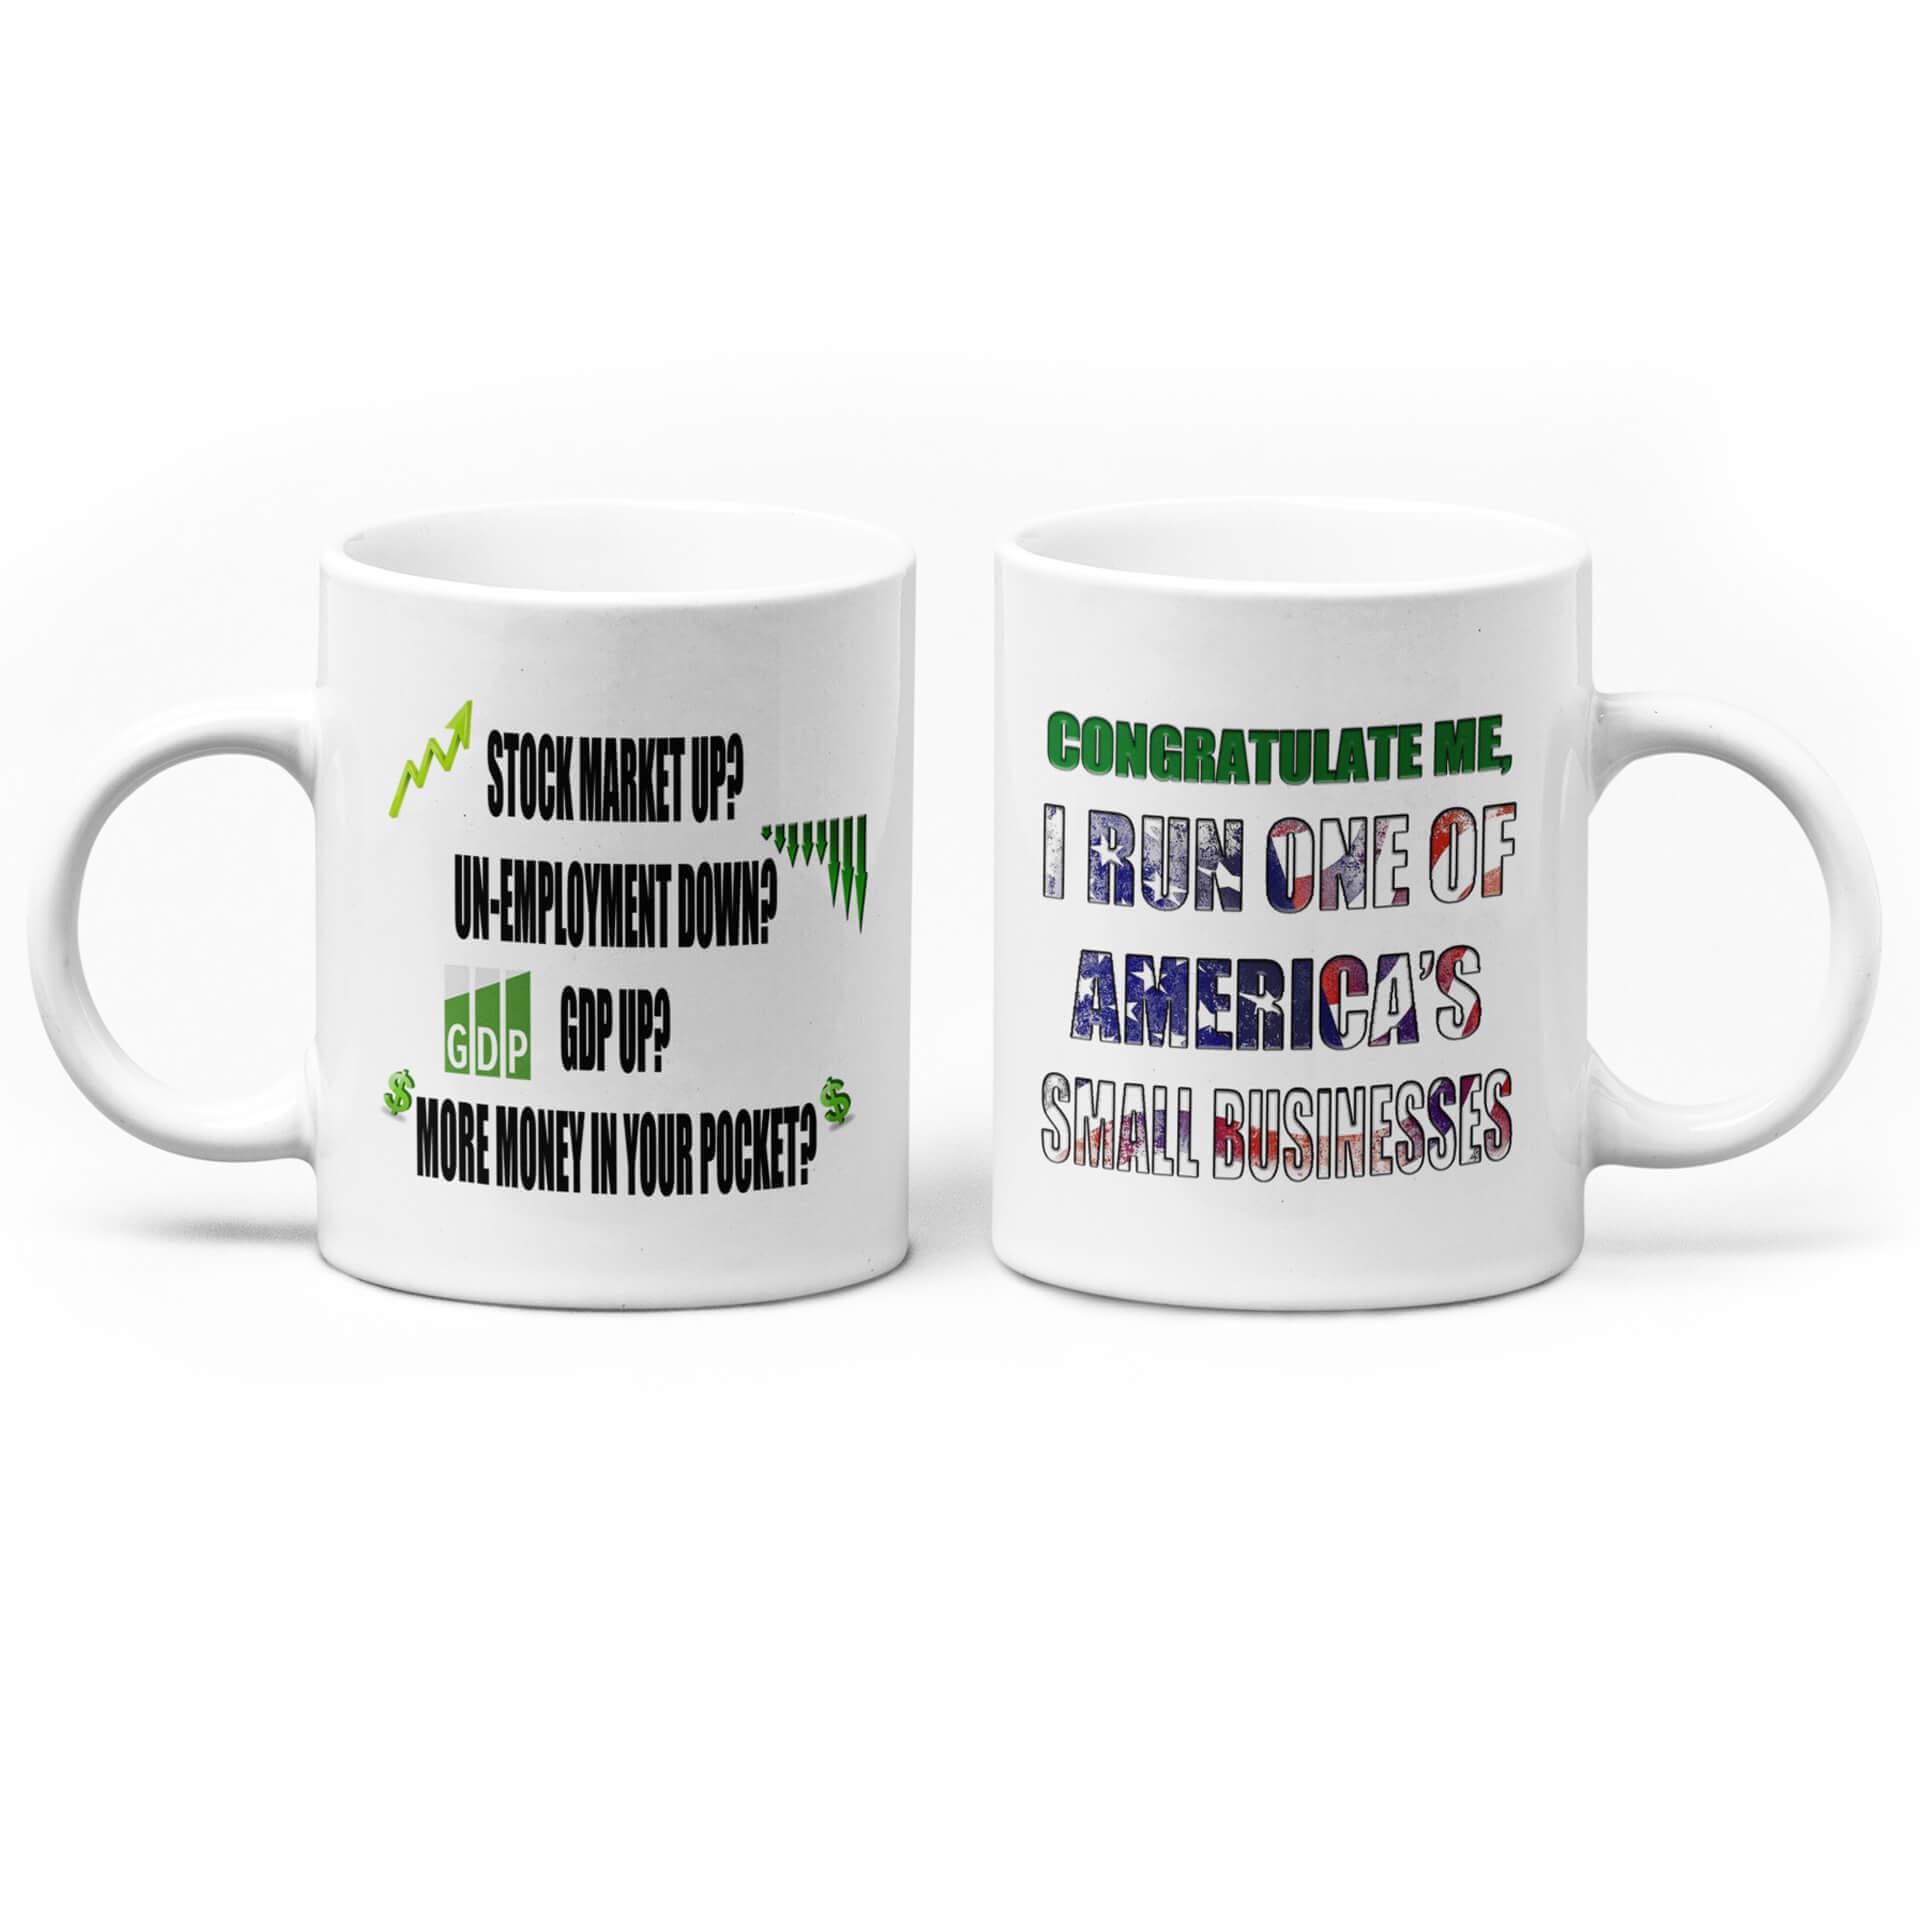 Congratulate Me, I Run One of America's Small Businesses Mug